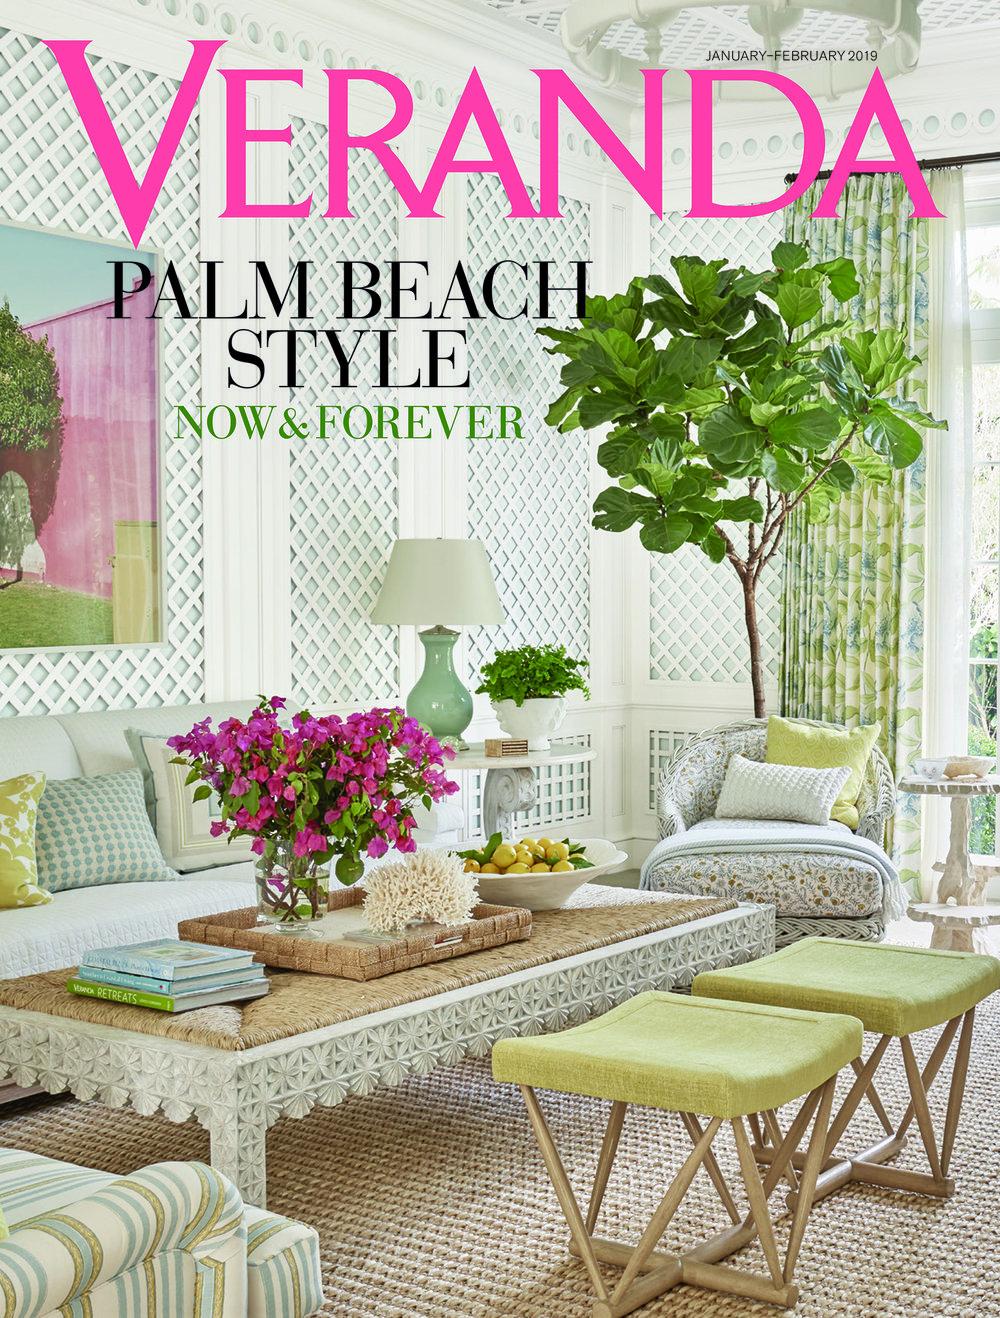 Veranda January/February 2019 Palm Beach Issue